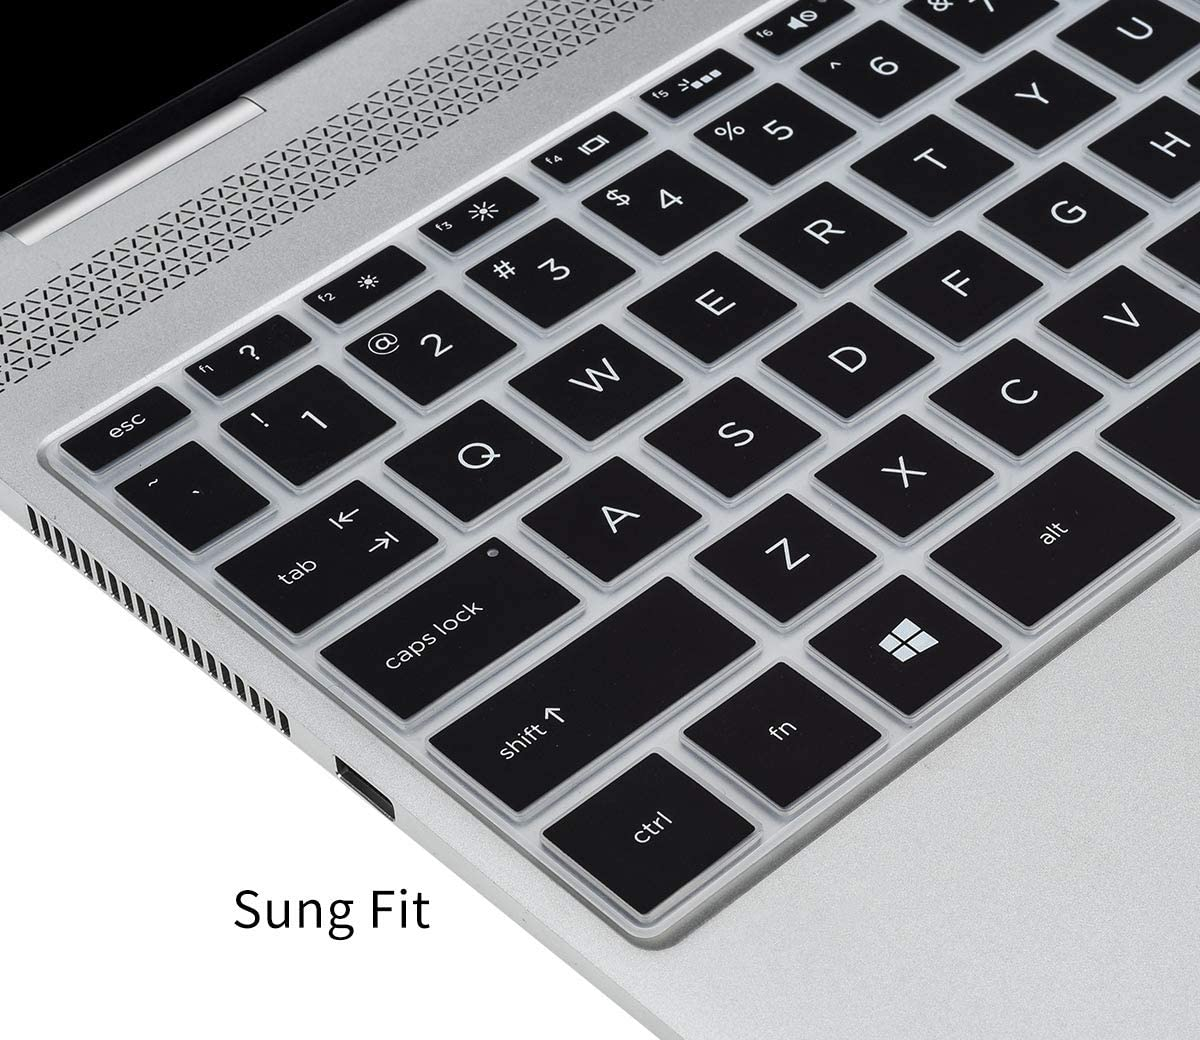 Black CaseBuy Keyboard Cover for 2020 2019 HP Envy 13 13.3 inch Laptop aq0005nr aq0044nr aq0045cl //2020 2019 HP Pavilion 13 an1010nr an0031wm HP Envy 13 2020 Keyboard Protector Skin